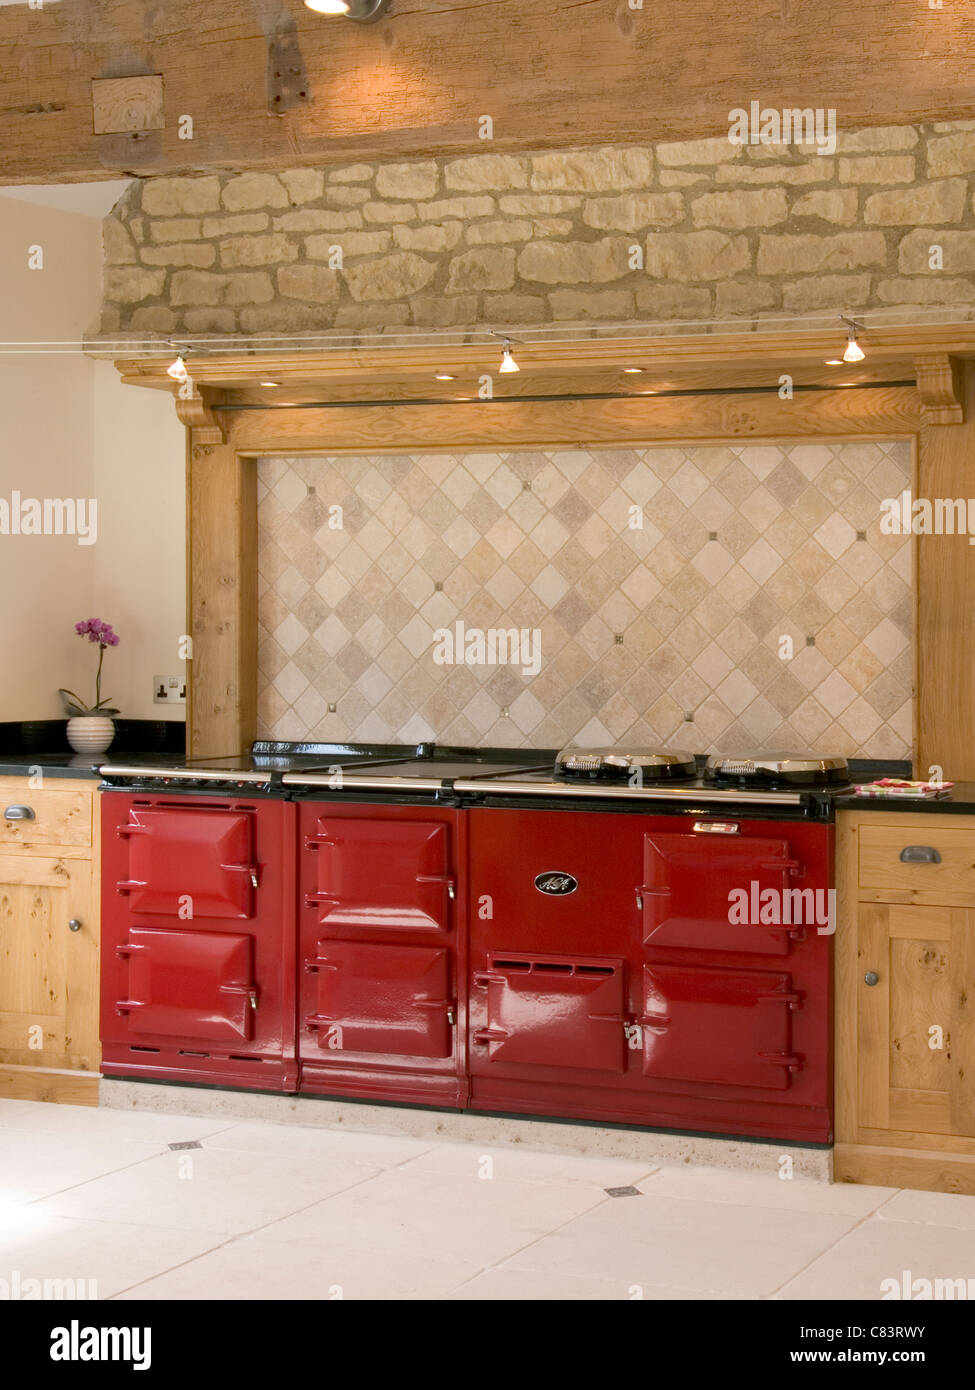 Aga Range Cooker Stock Photos & Aga Range Cooker Stock Images - Alamy